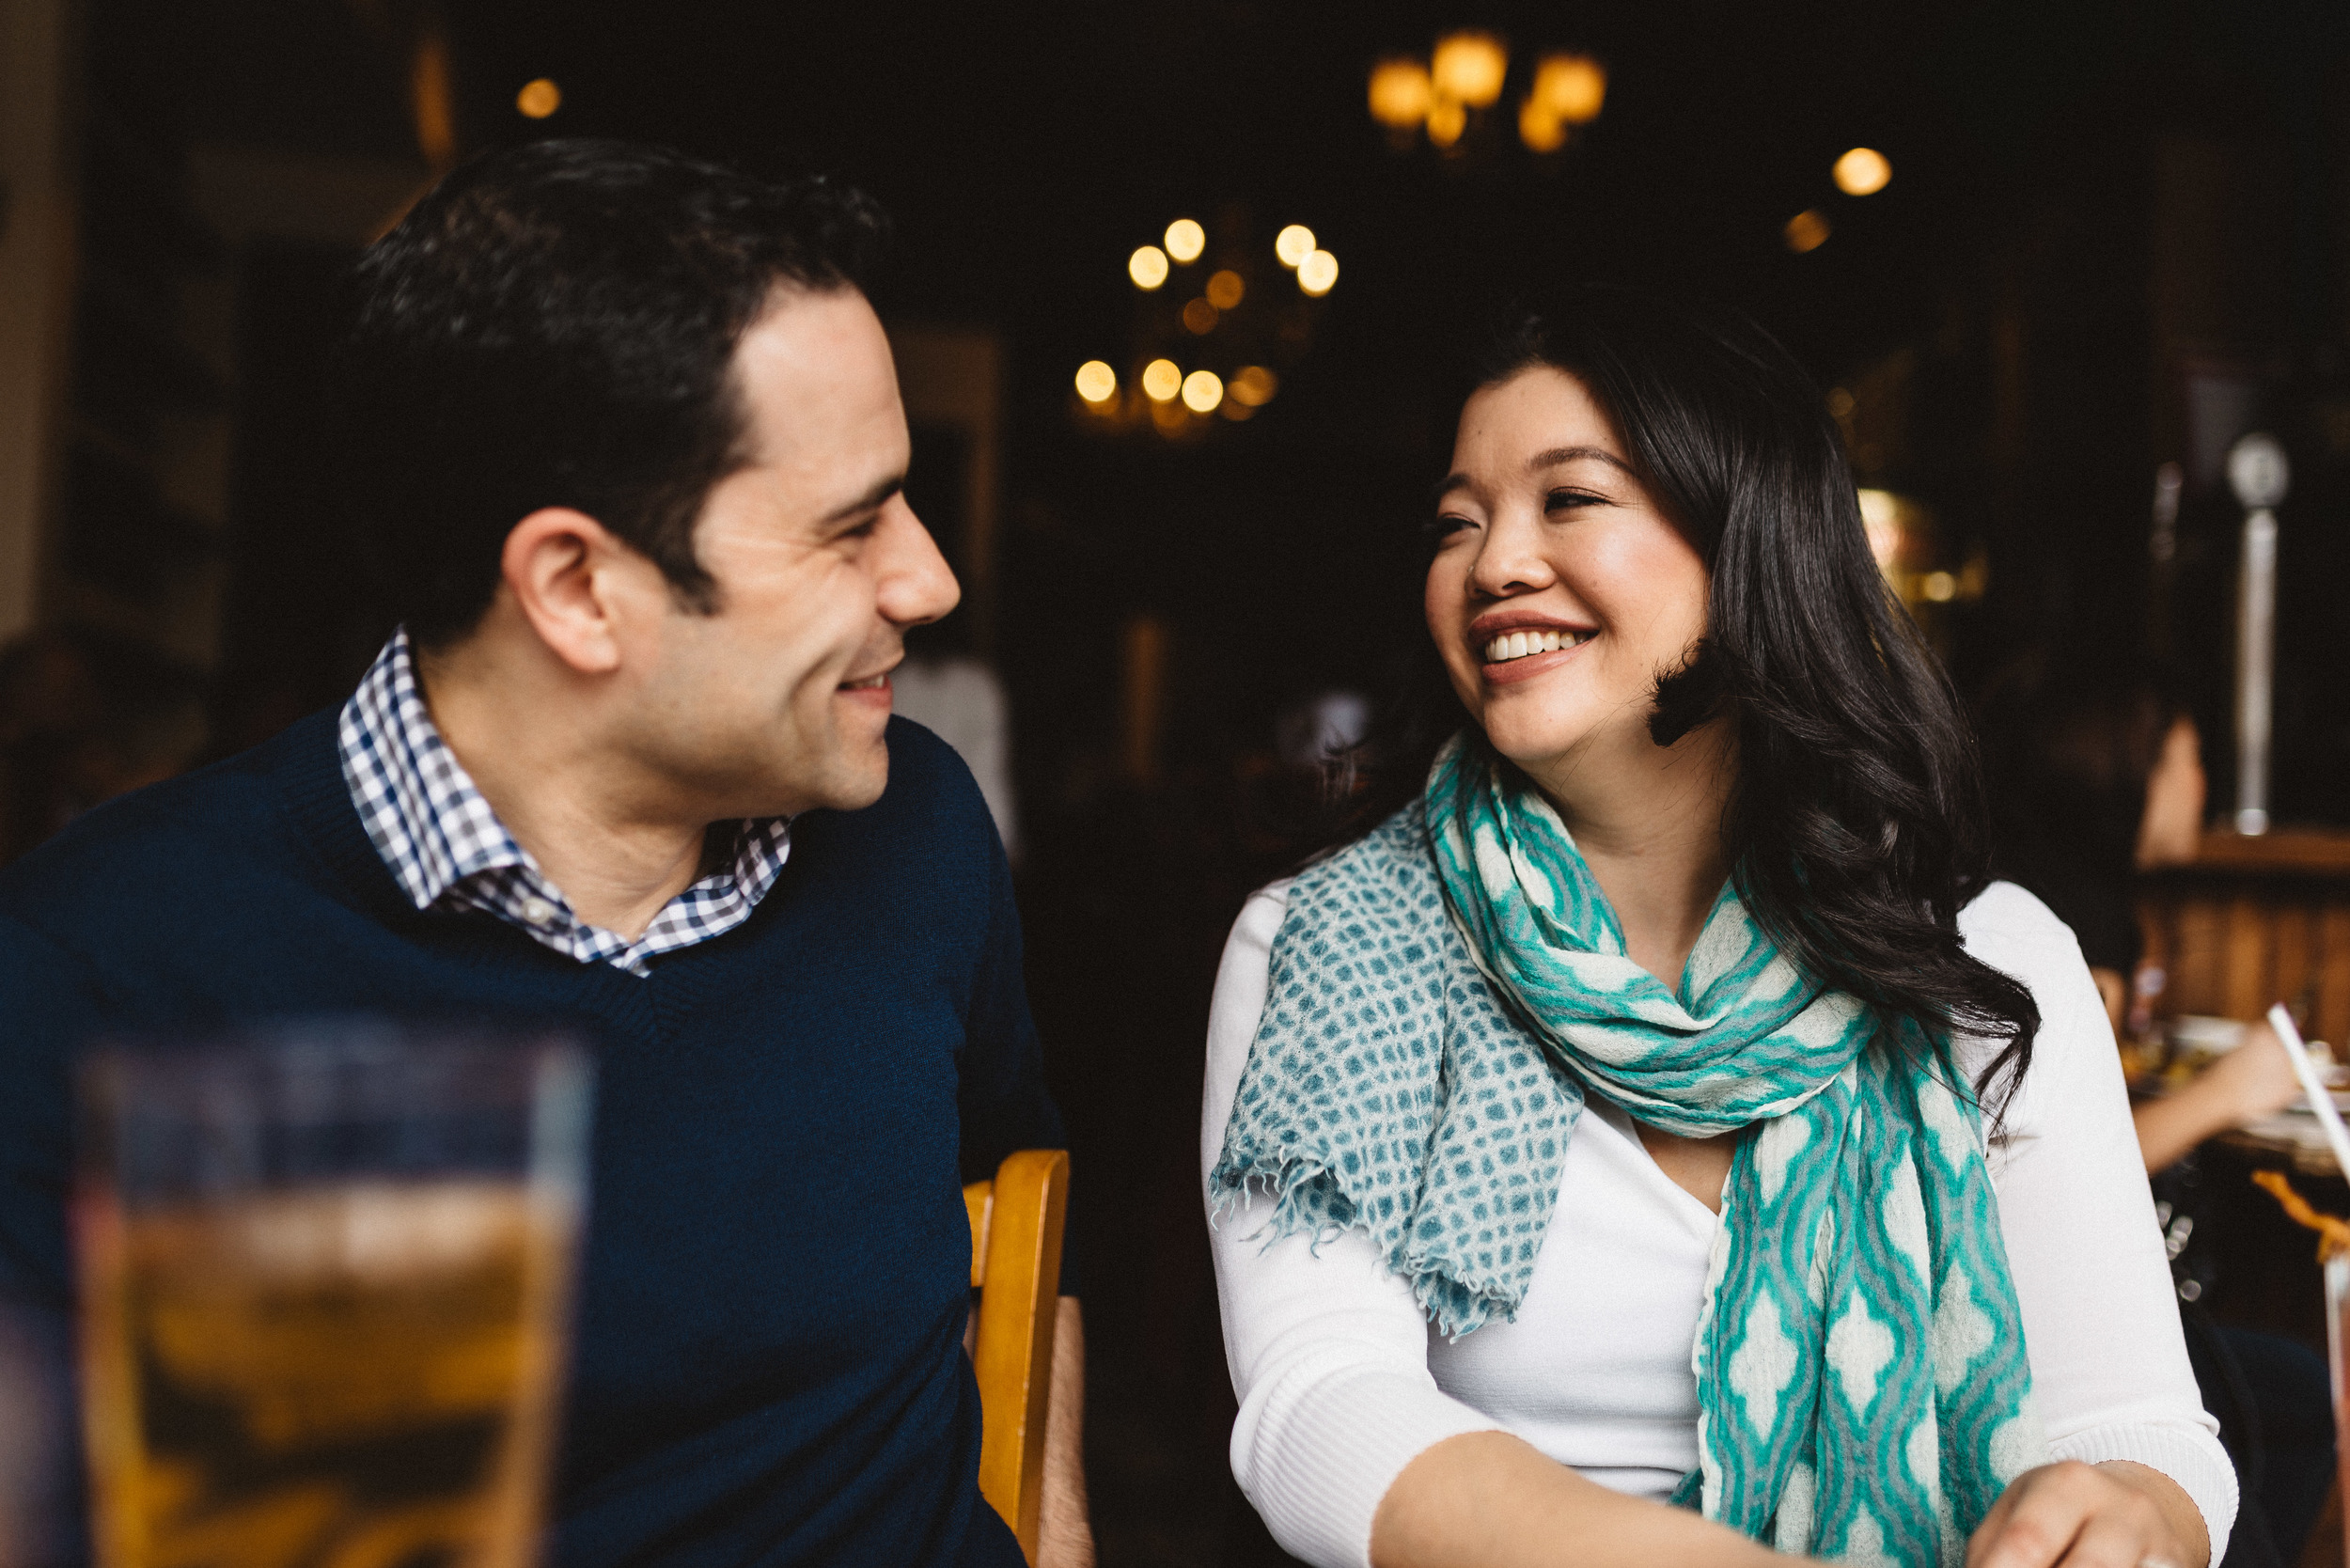 Candid shot of couple having brunch